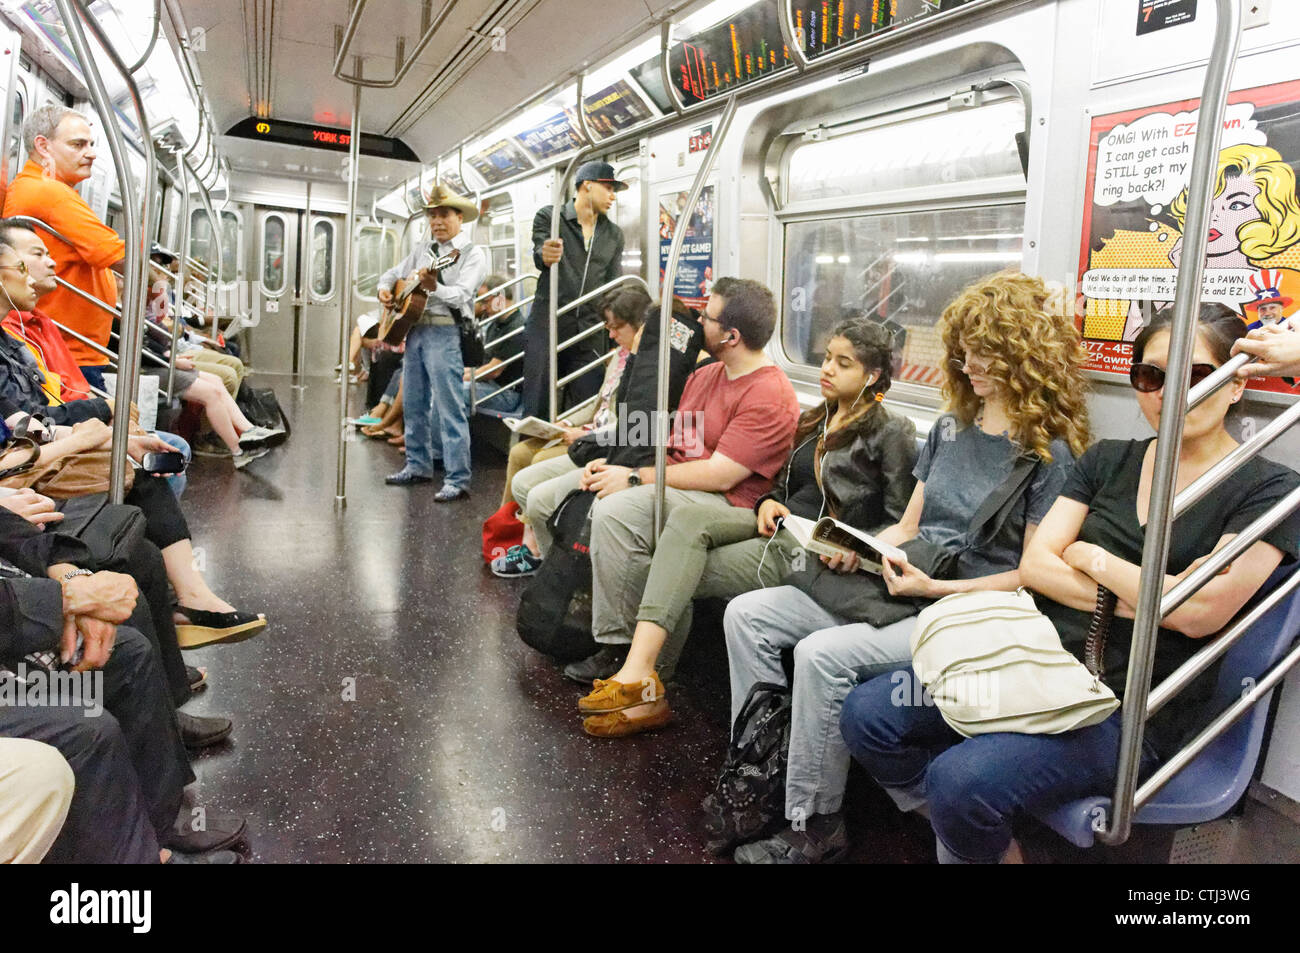 Image Gallery nyc subway train people